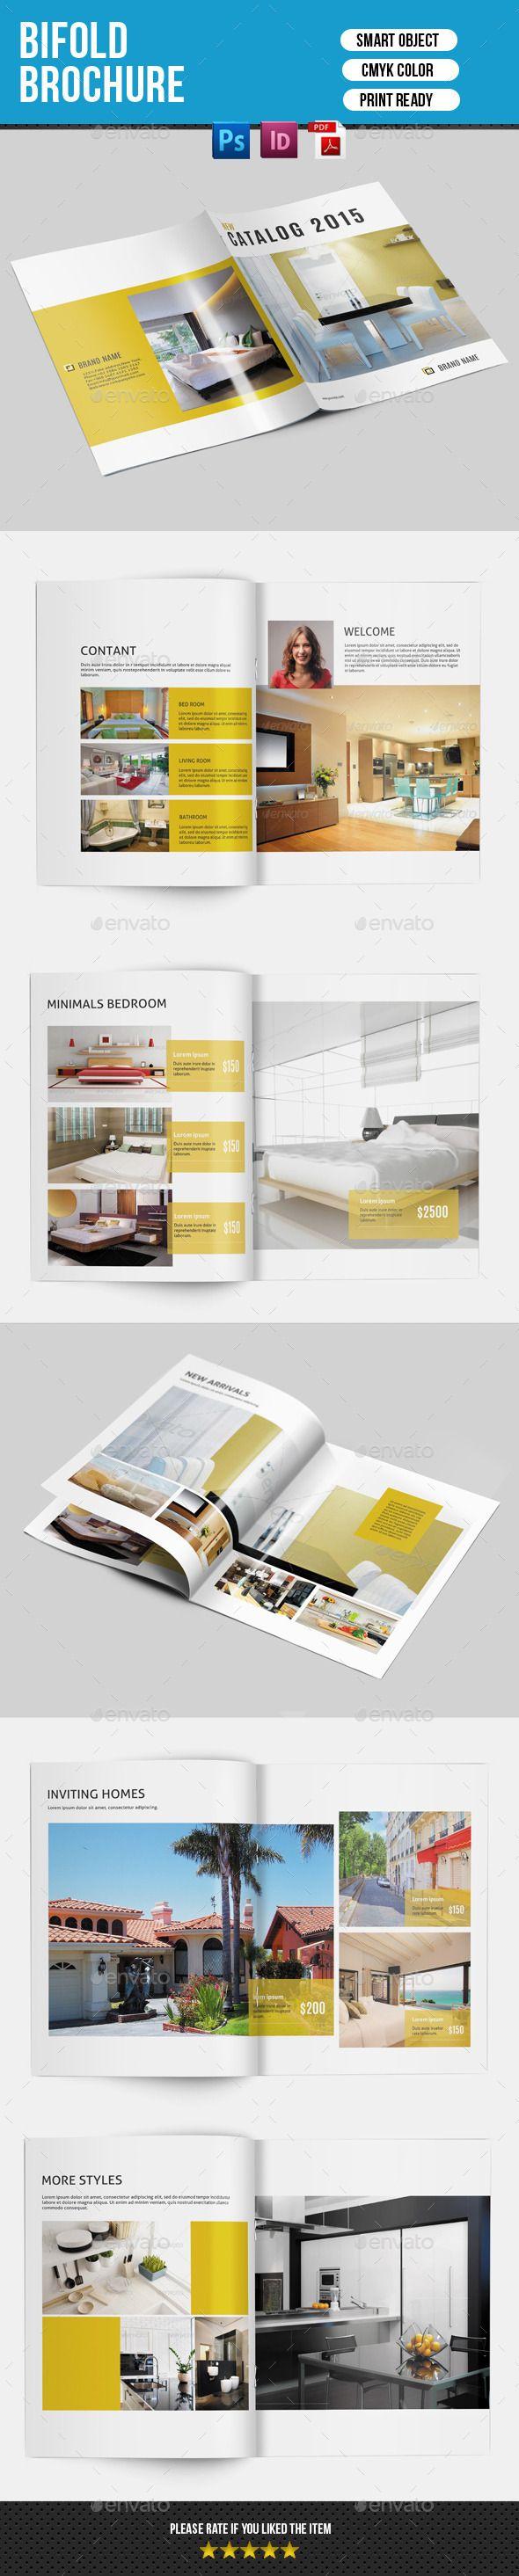 Bifold Brochure For Interior Design V141